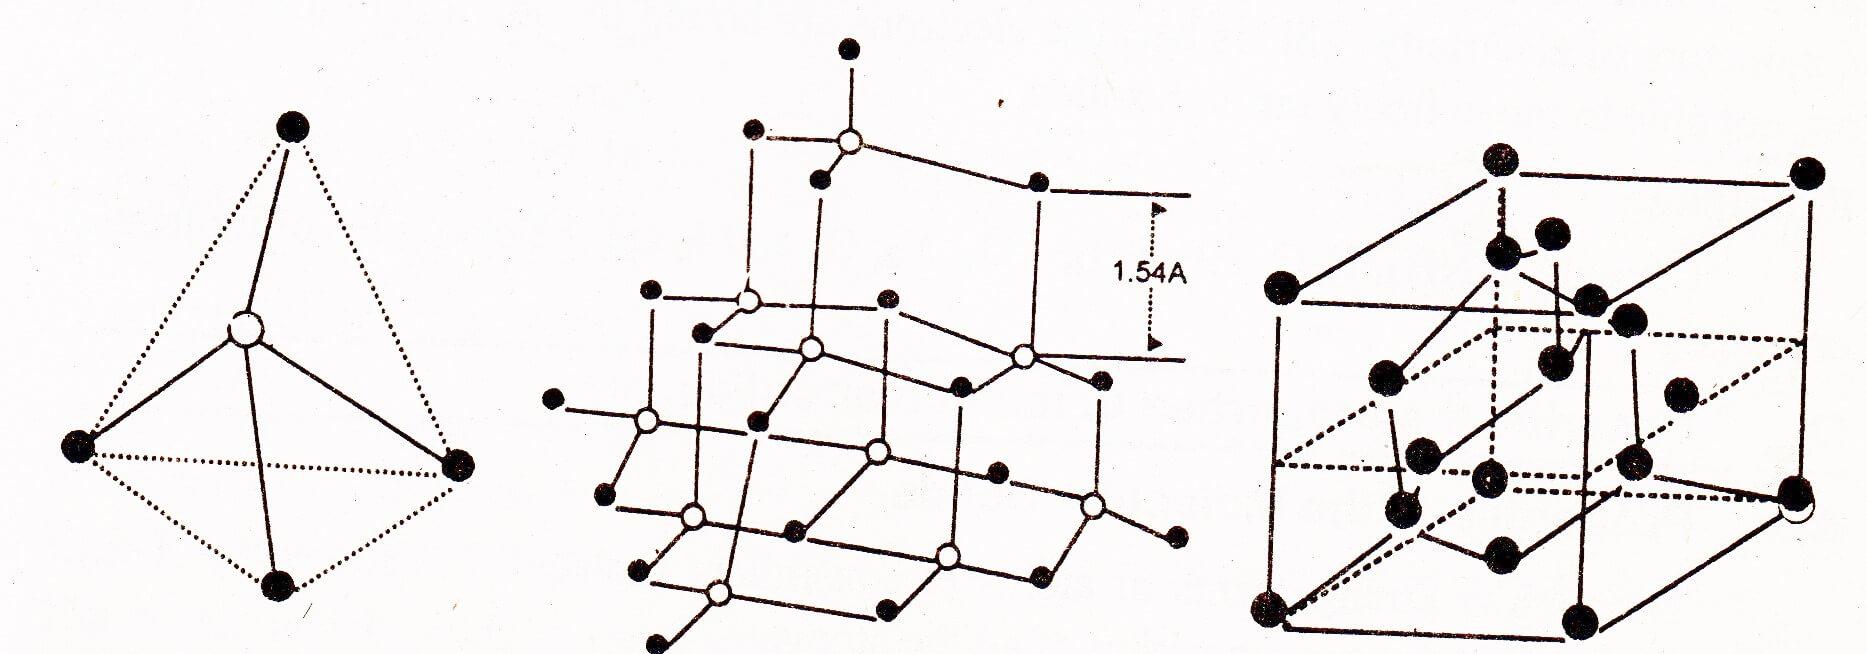 three dimensional structure of diamond